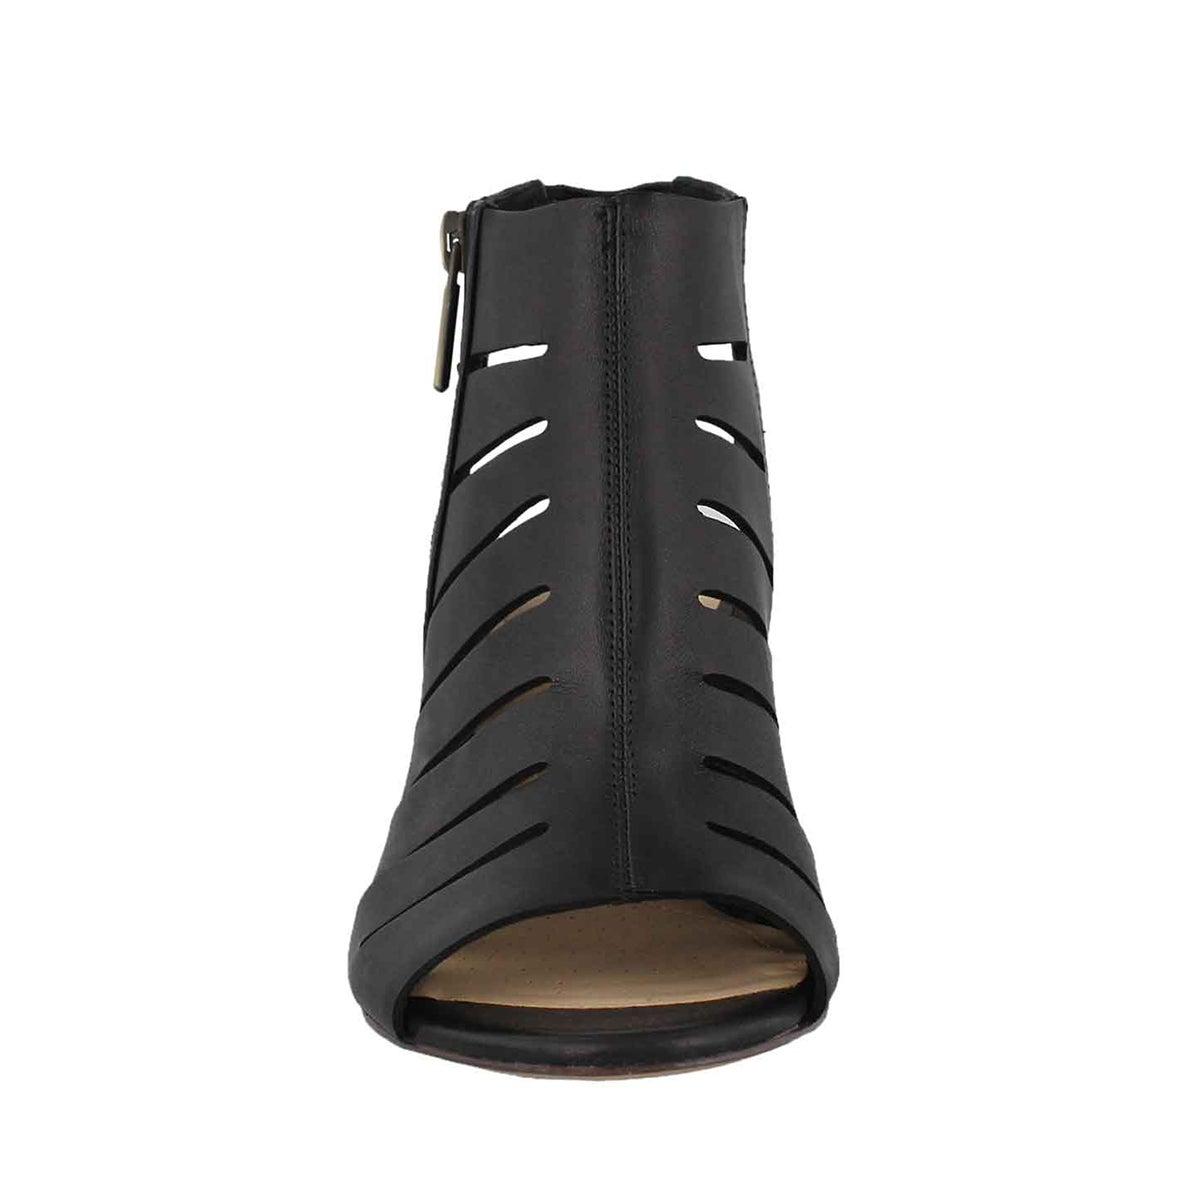 Lds Deloria Ivy black dress sandal